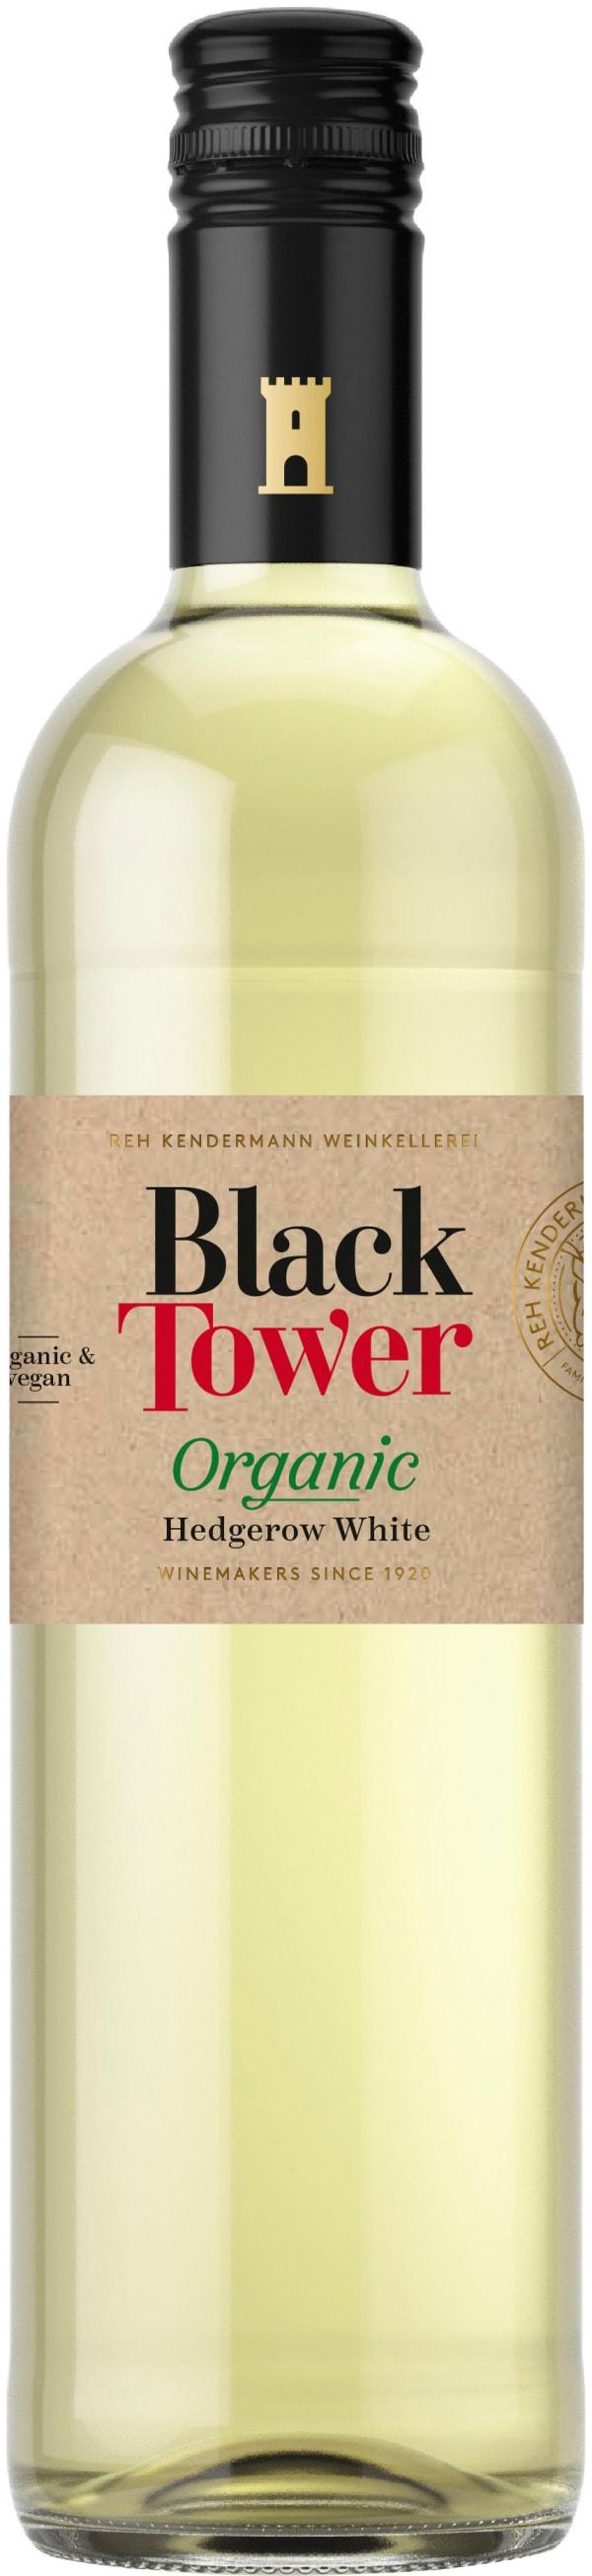 Black Tower Hedgerow Organic 2018